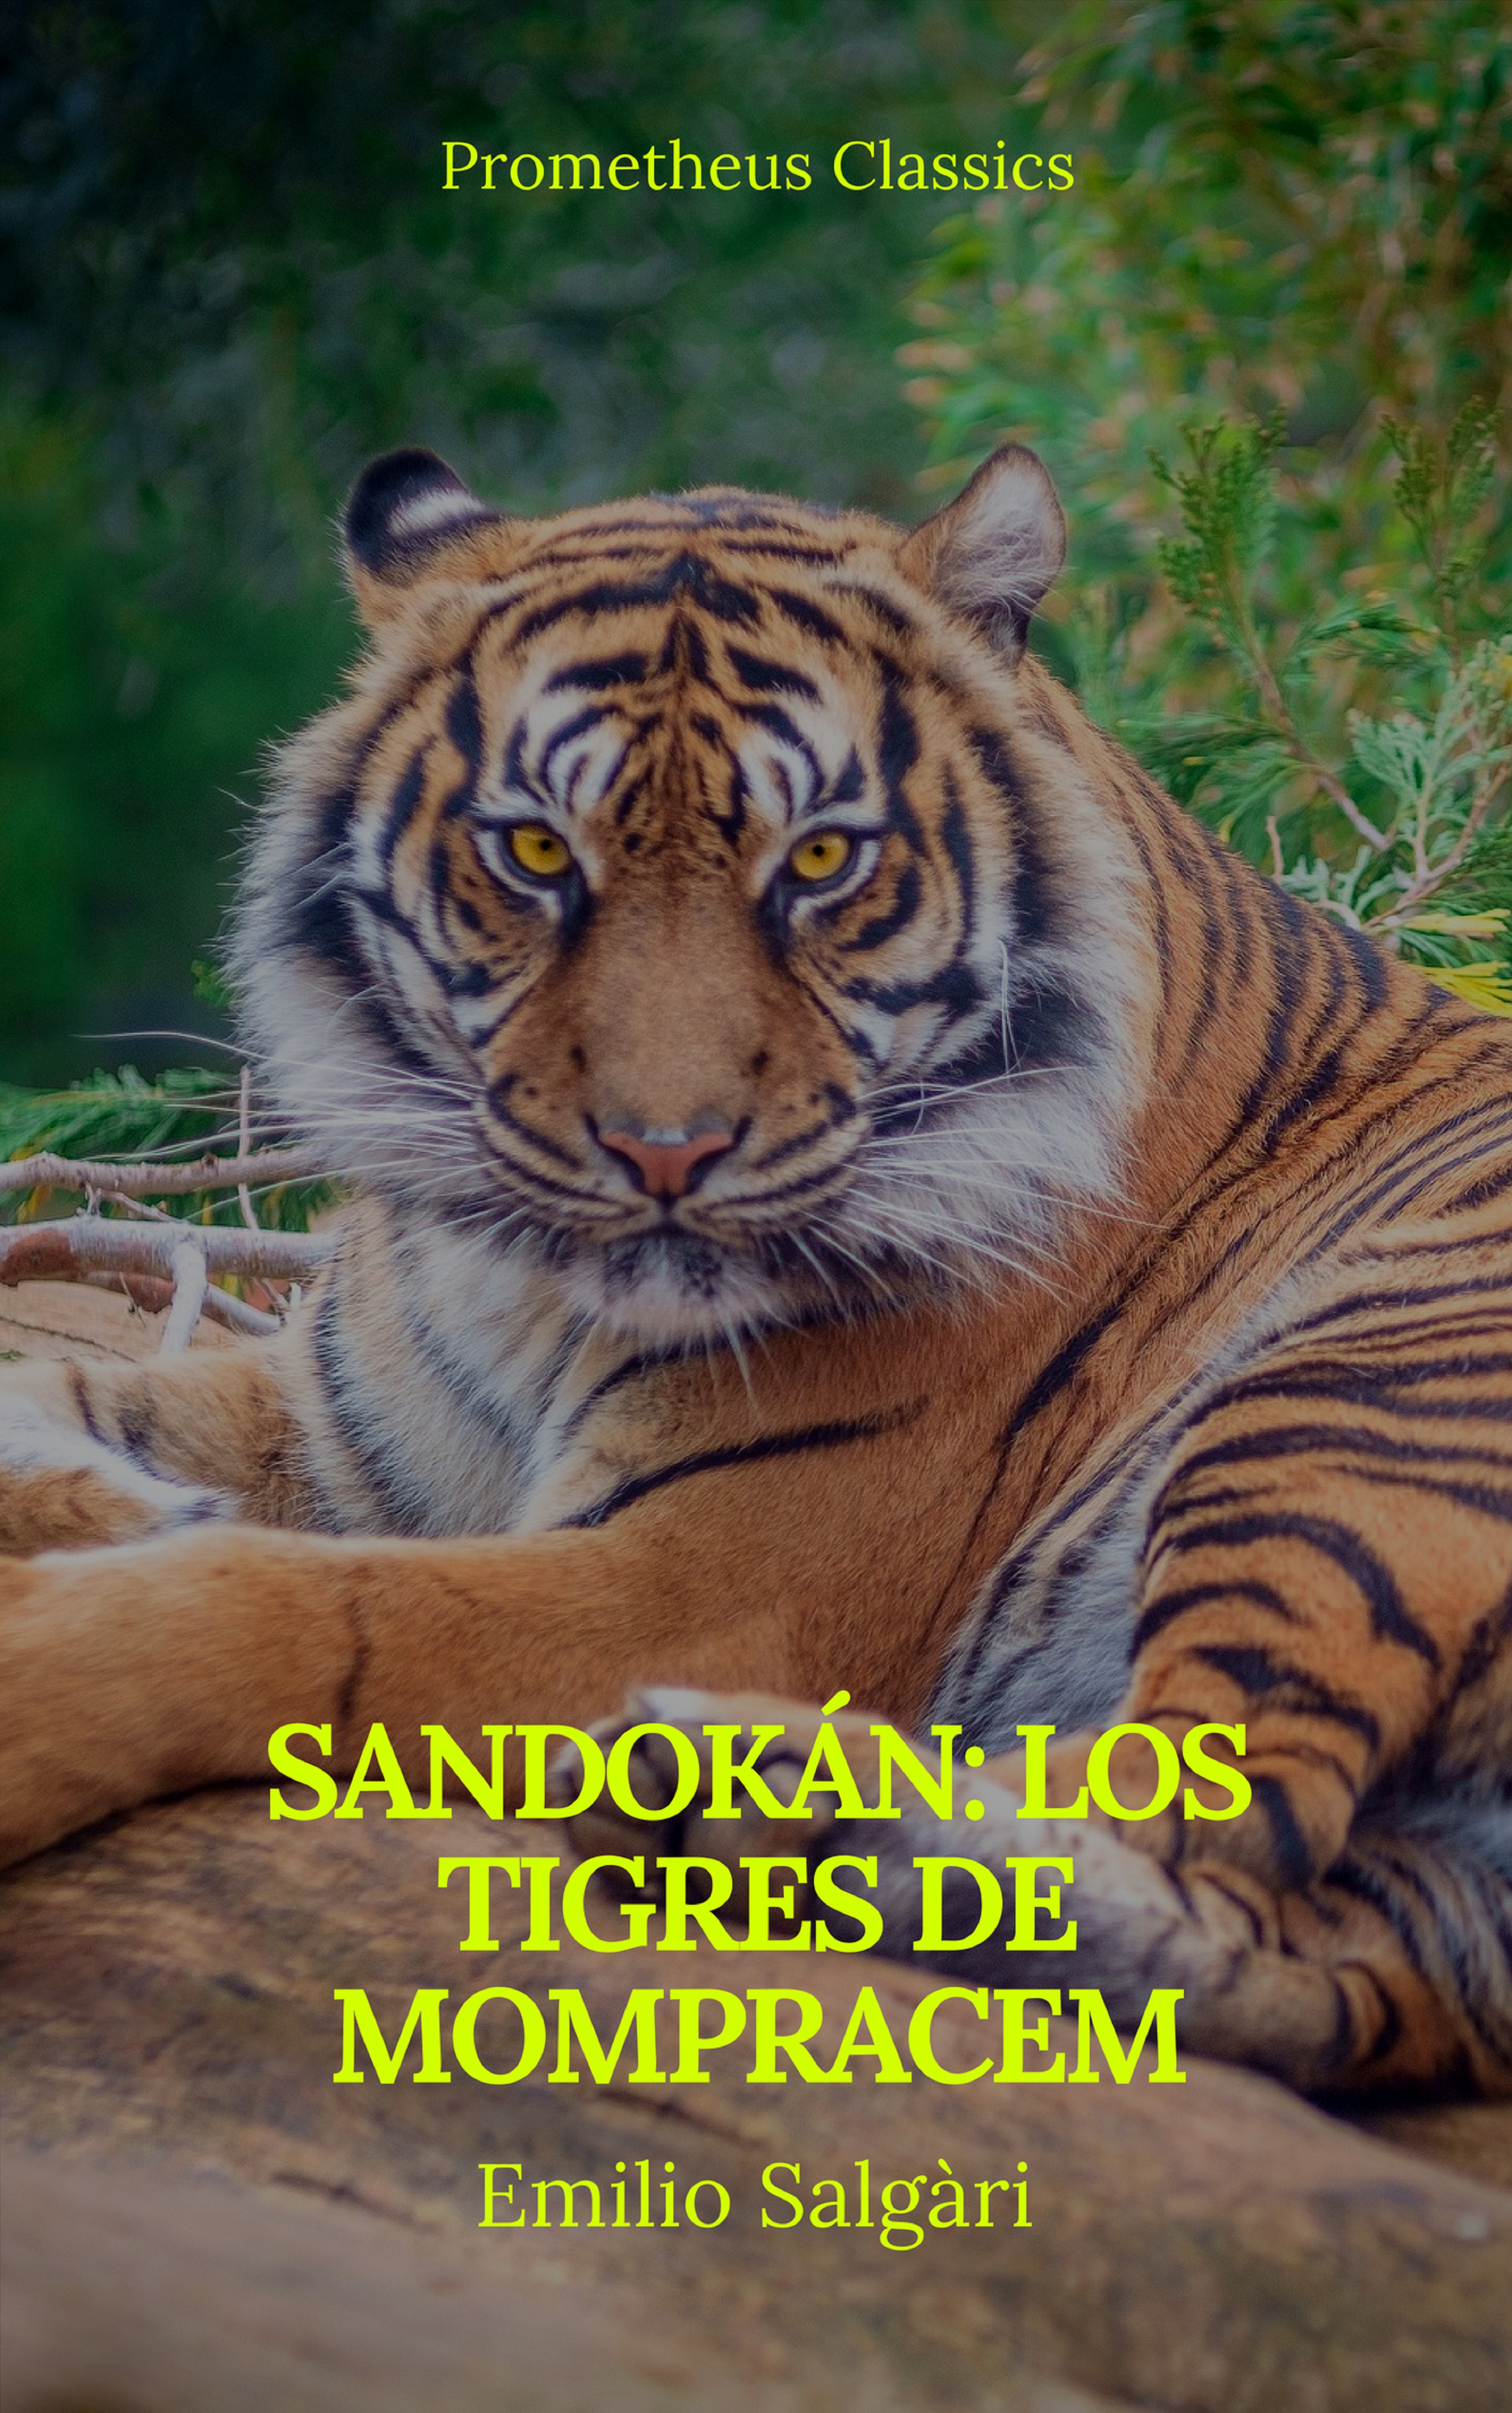 цена на Emilio Salgari Sandokán: Los tigres de Mompracem (Prometheus Classics)